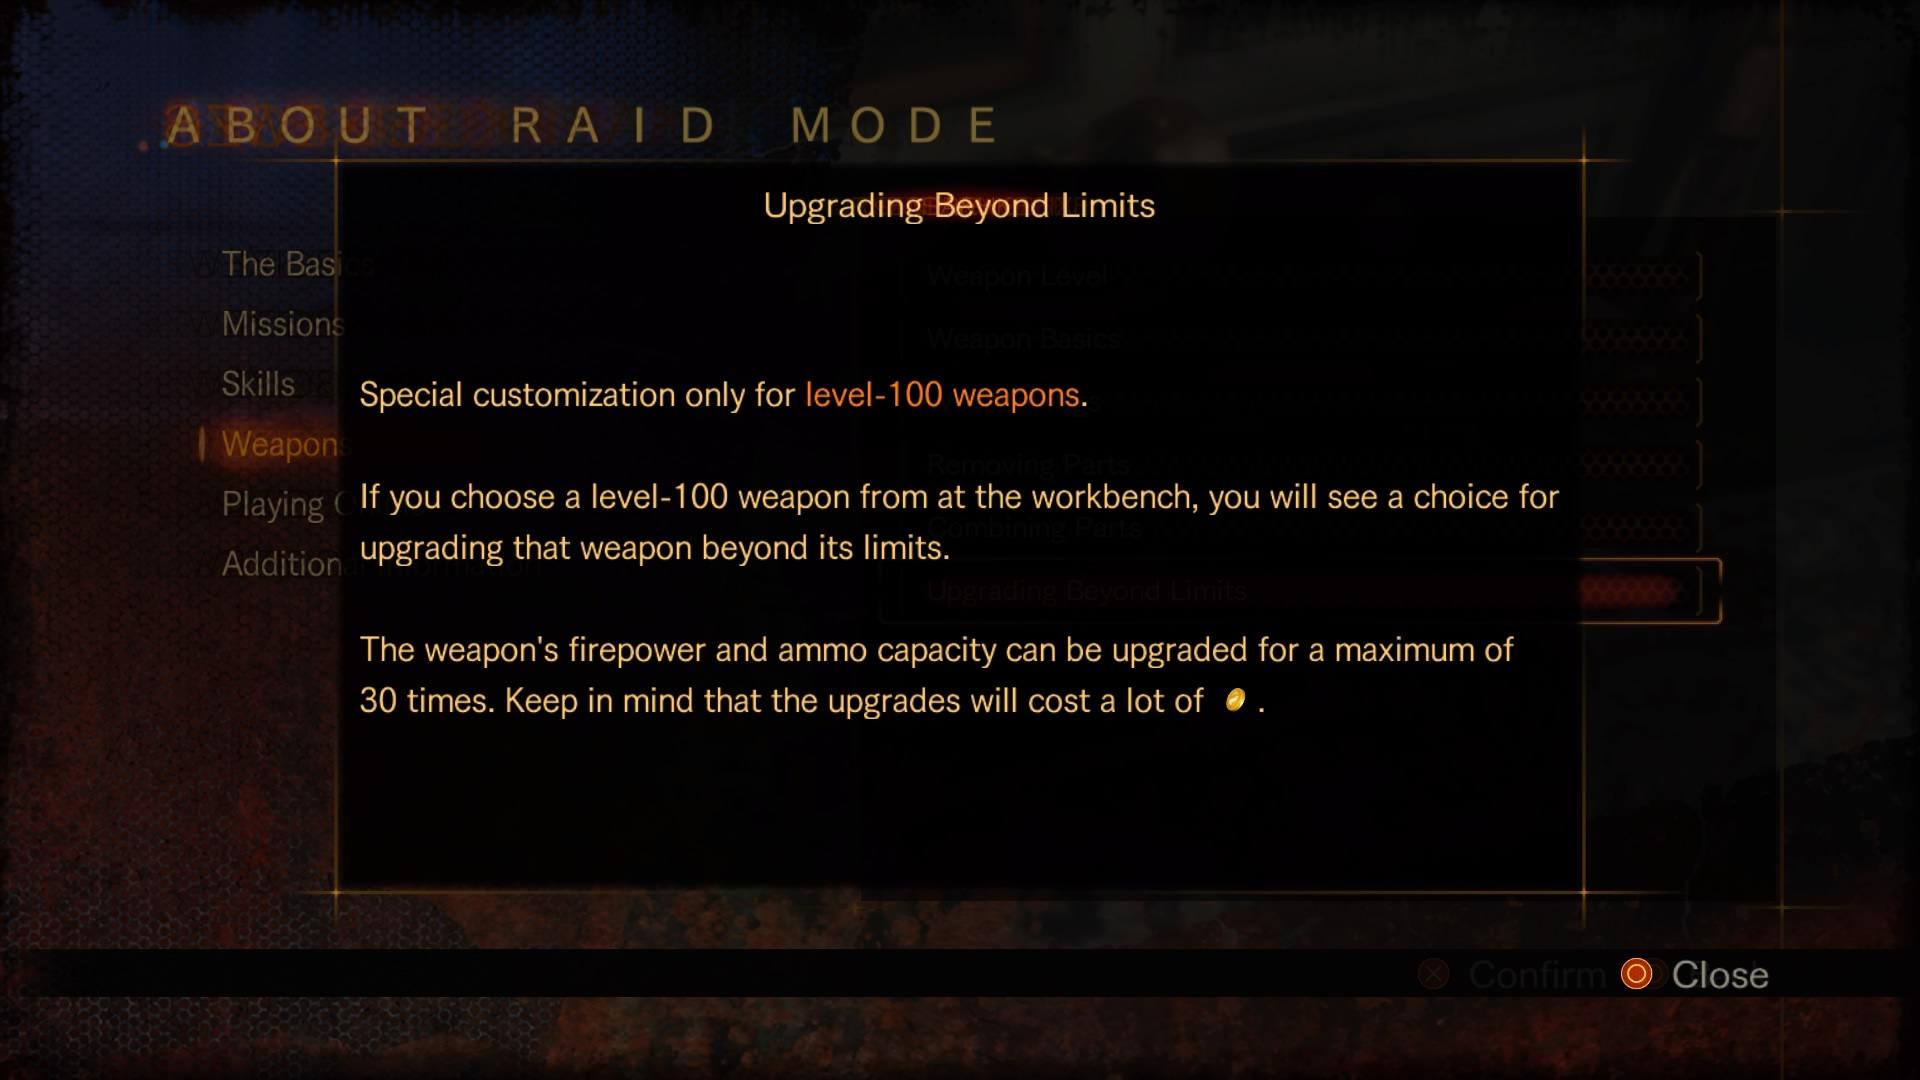 Upgrading Beyond Limits